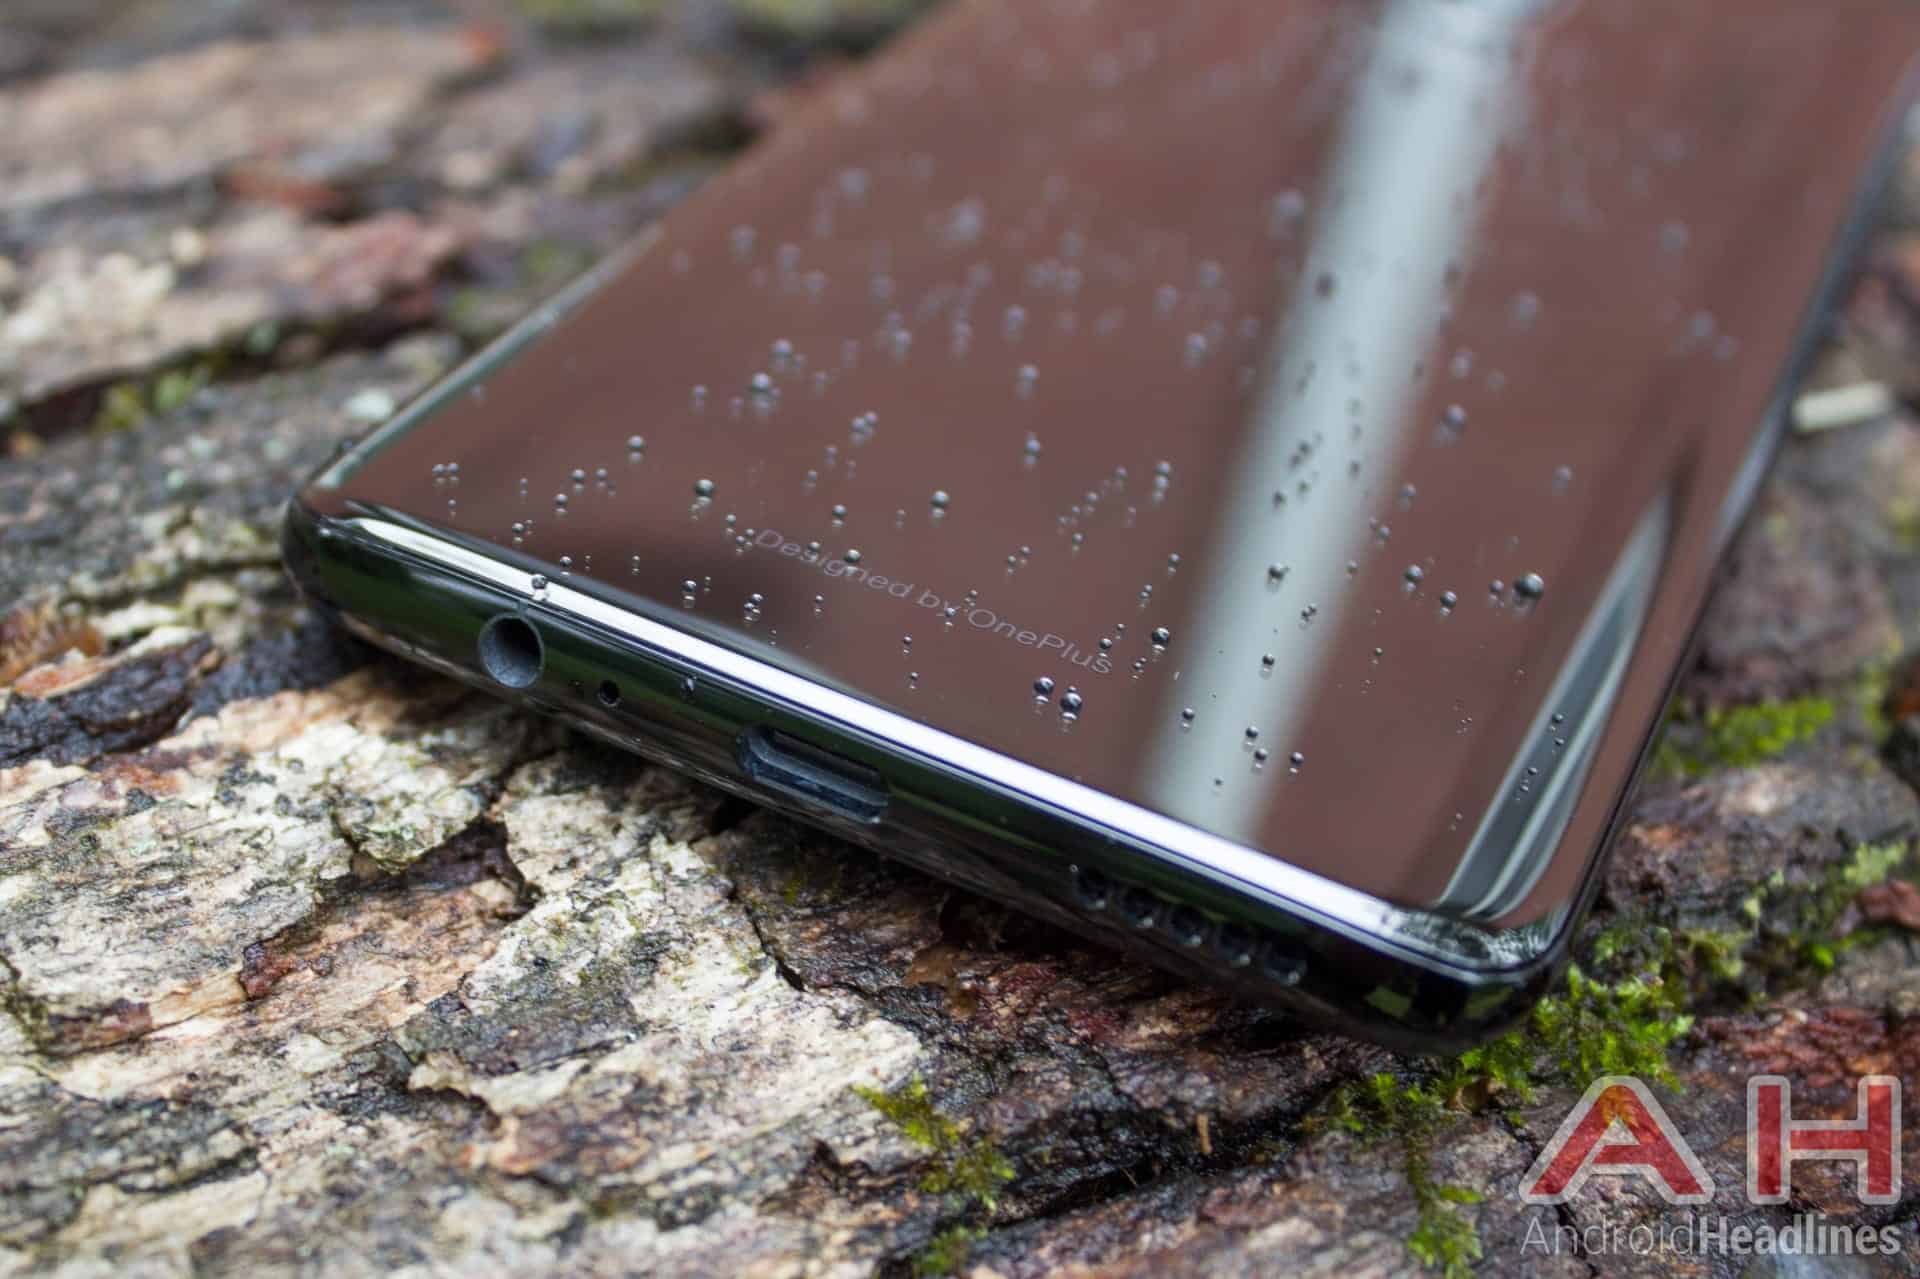 OnePlus 6 AH NS 05 3.5mm audio jack